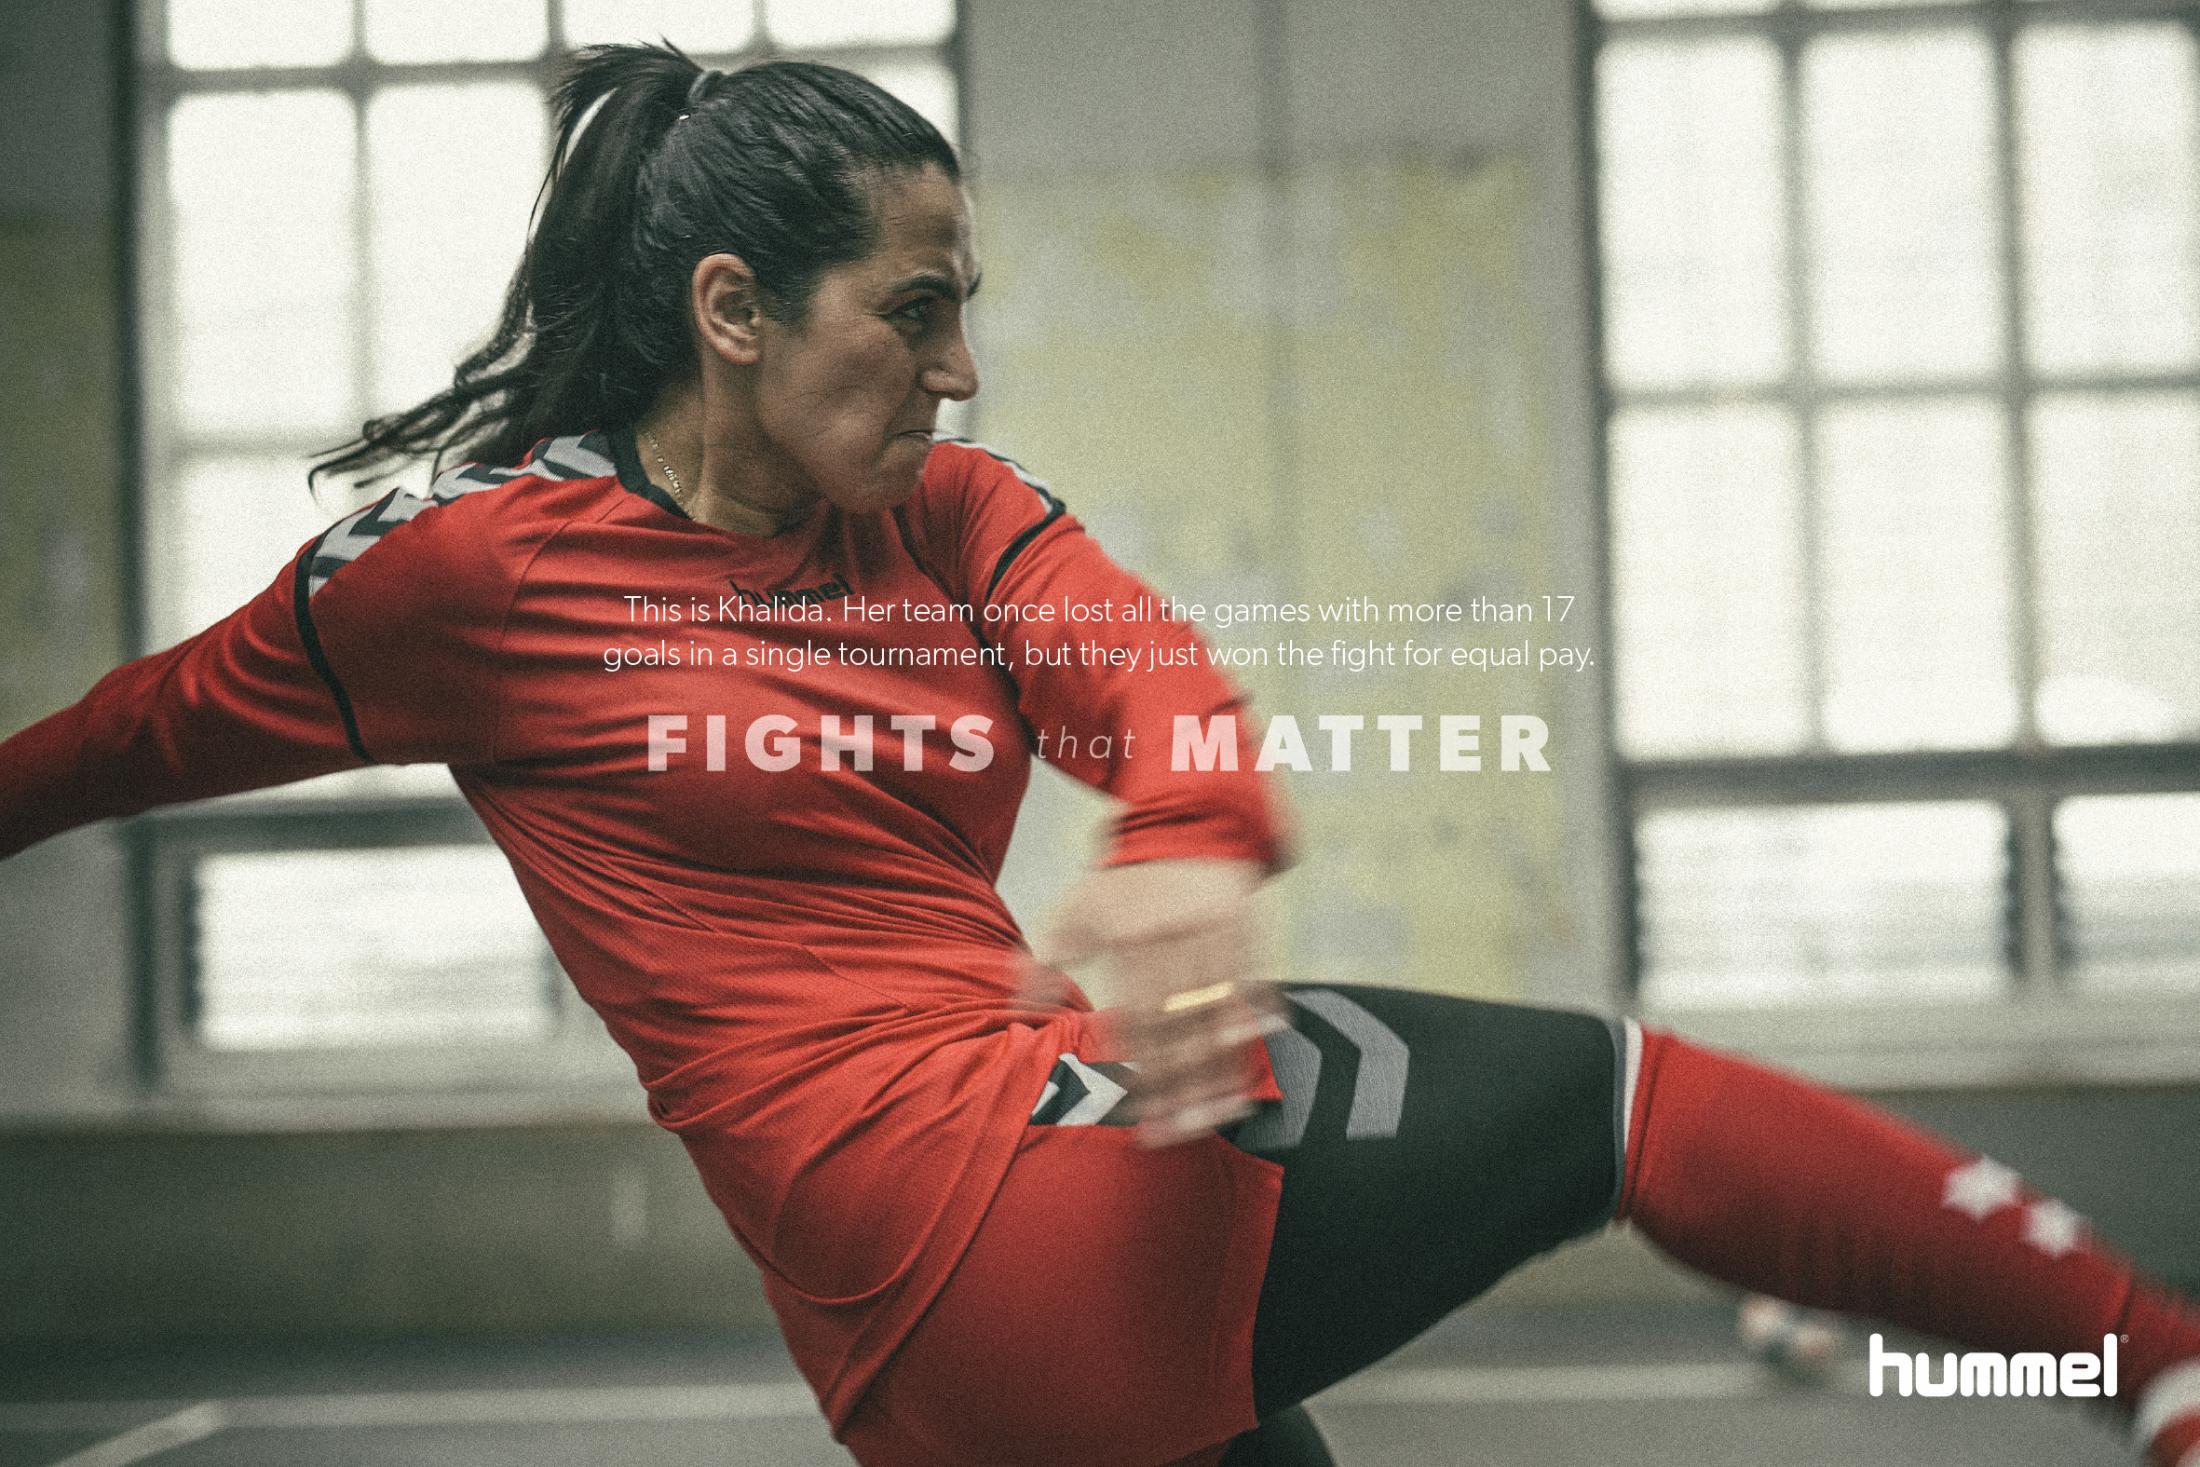 Hummel Print Ad - Fights That Matter - Khalida